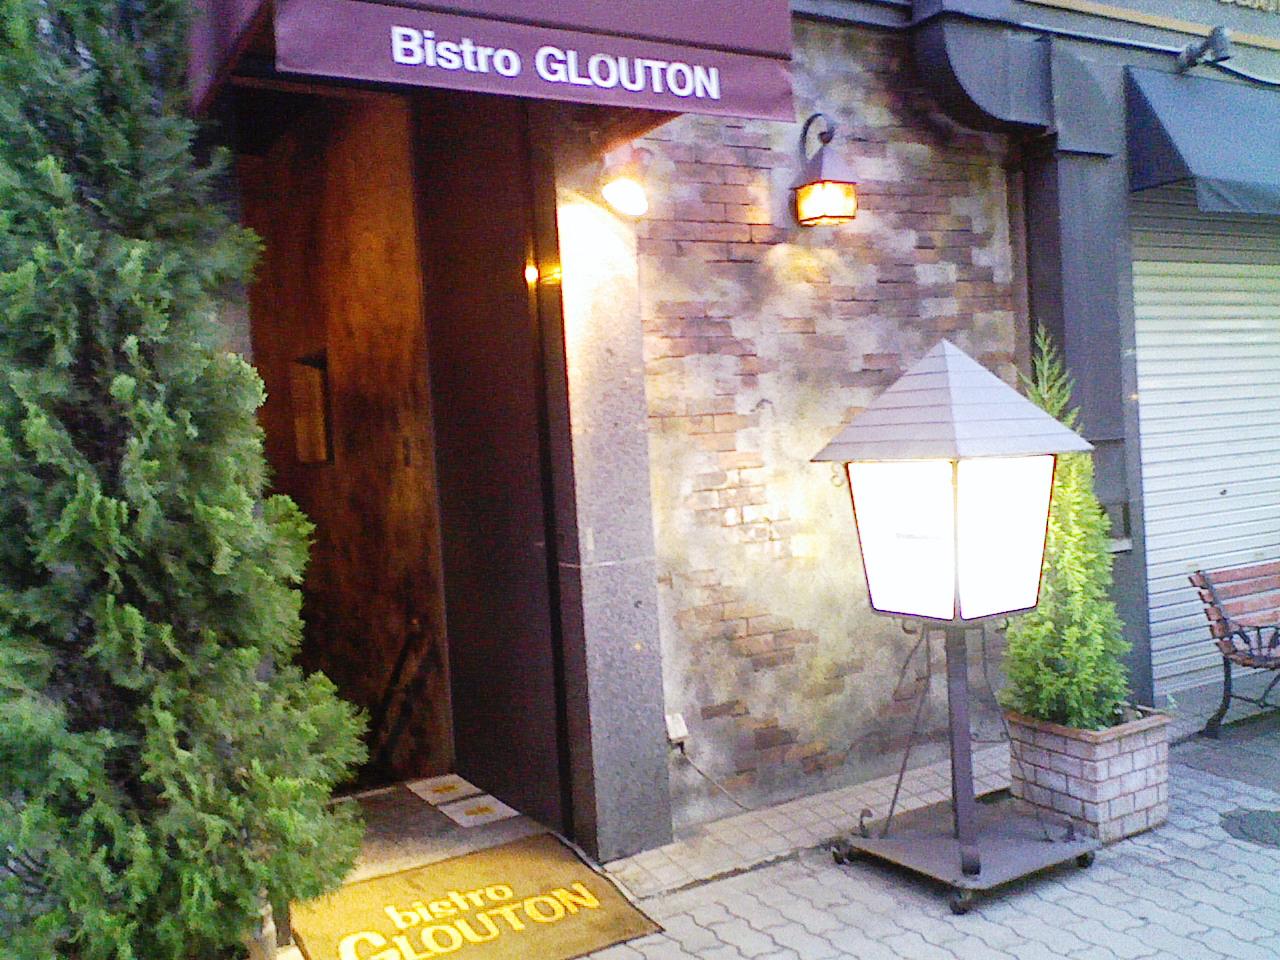 bistro Glouton